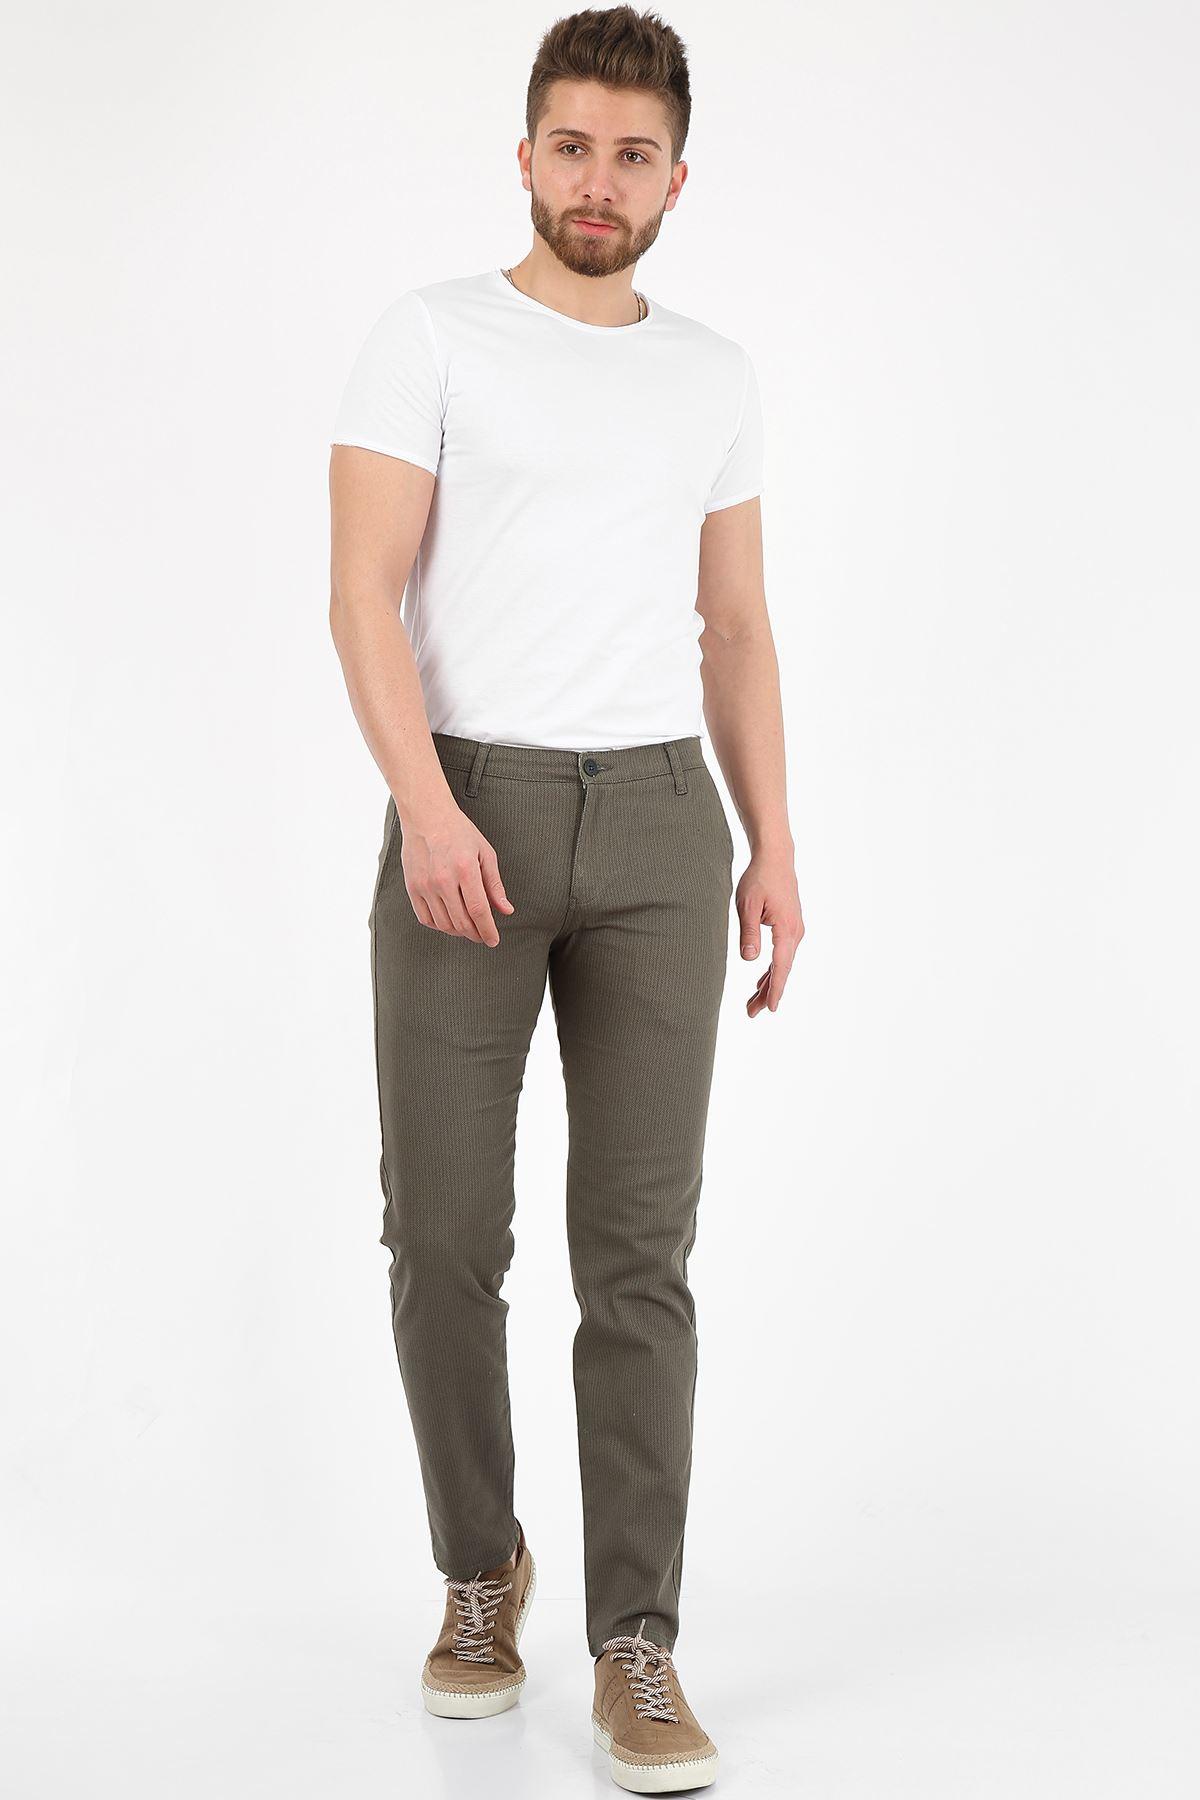 Haki Slim Fit Erkek Chino Pantolon -OLİVER